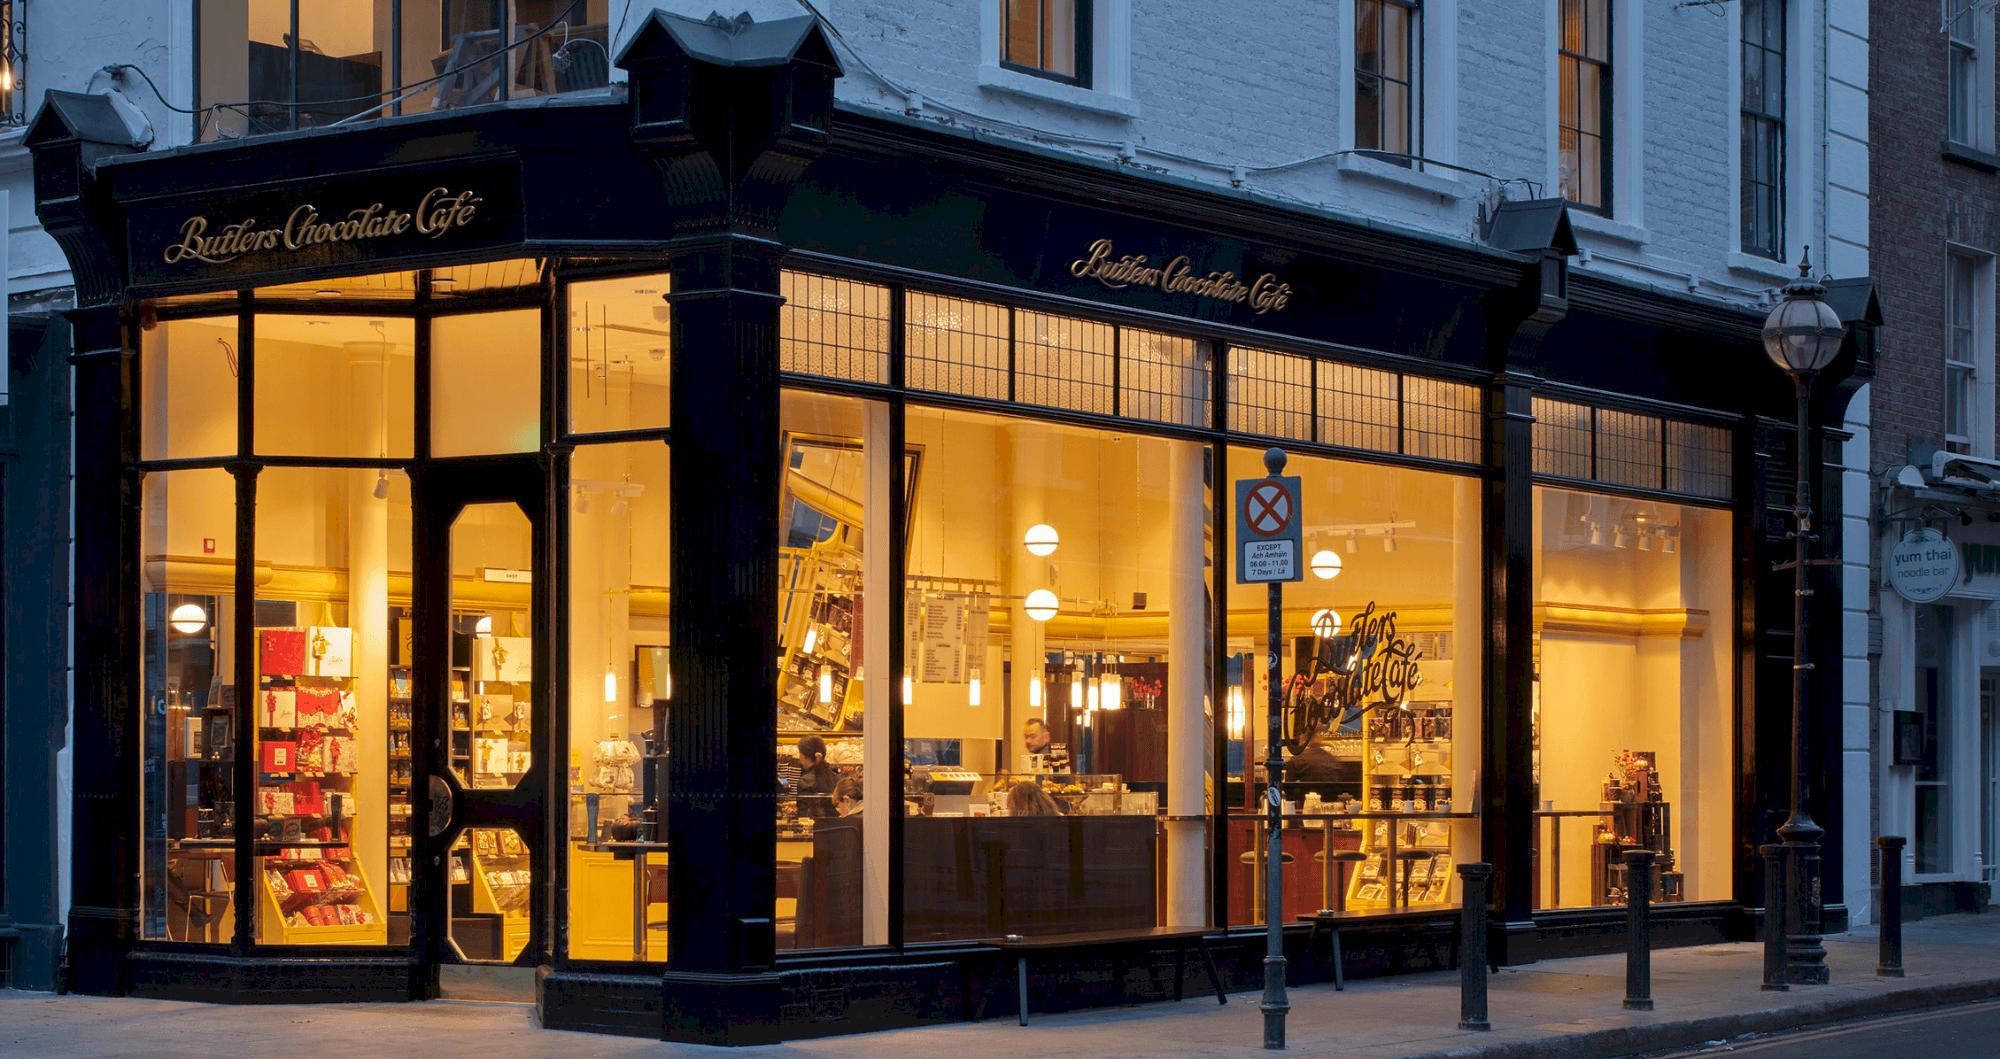 Butlers Chocolate Café, Dawson Street